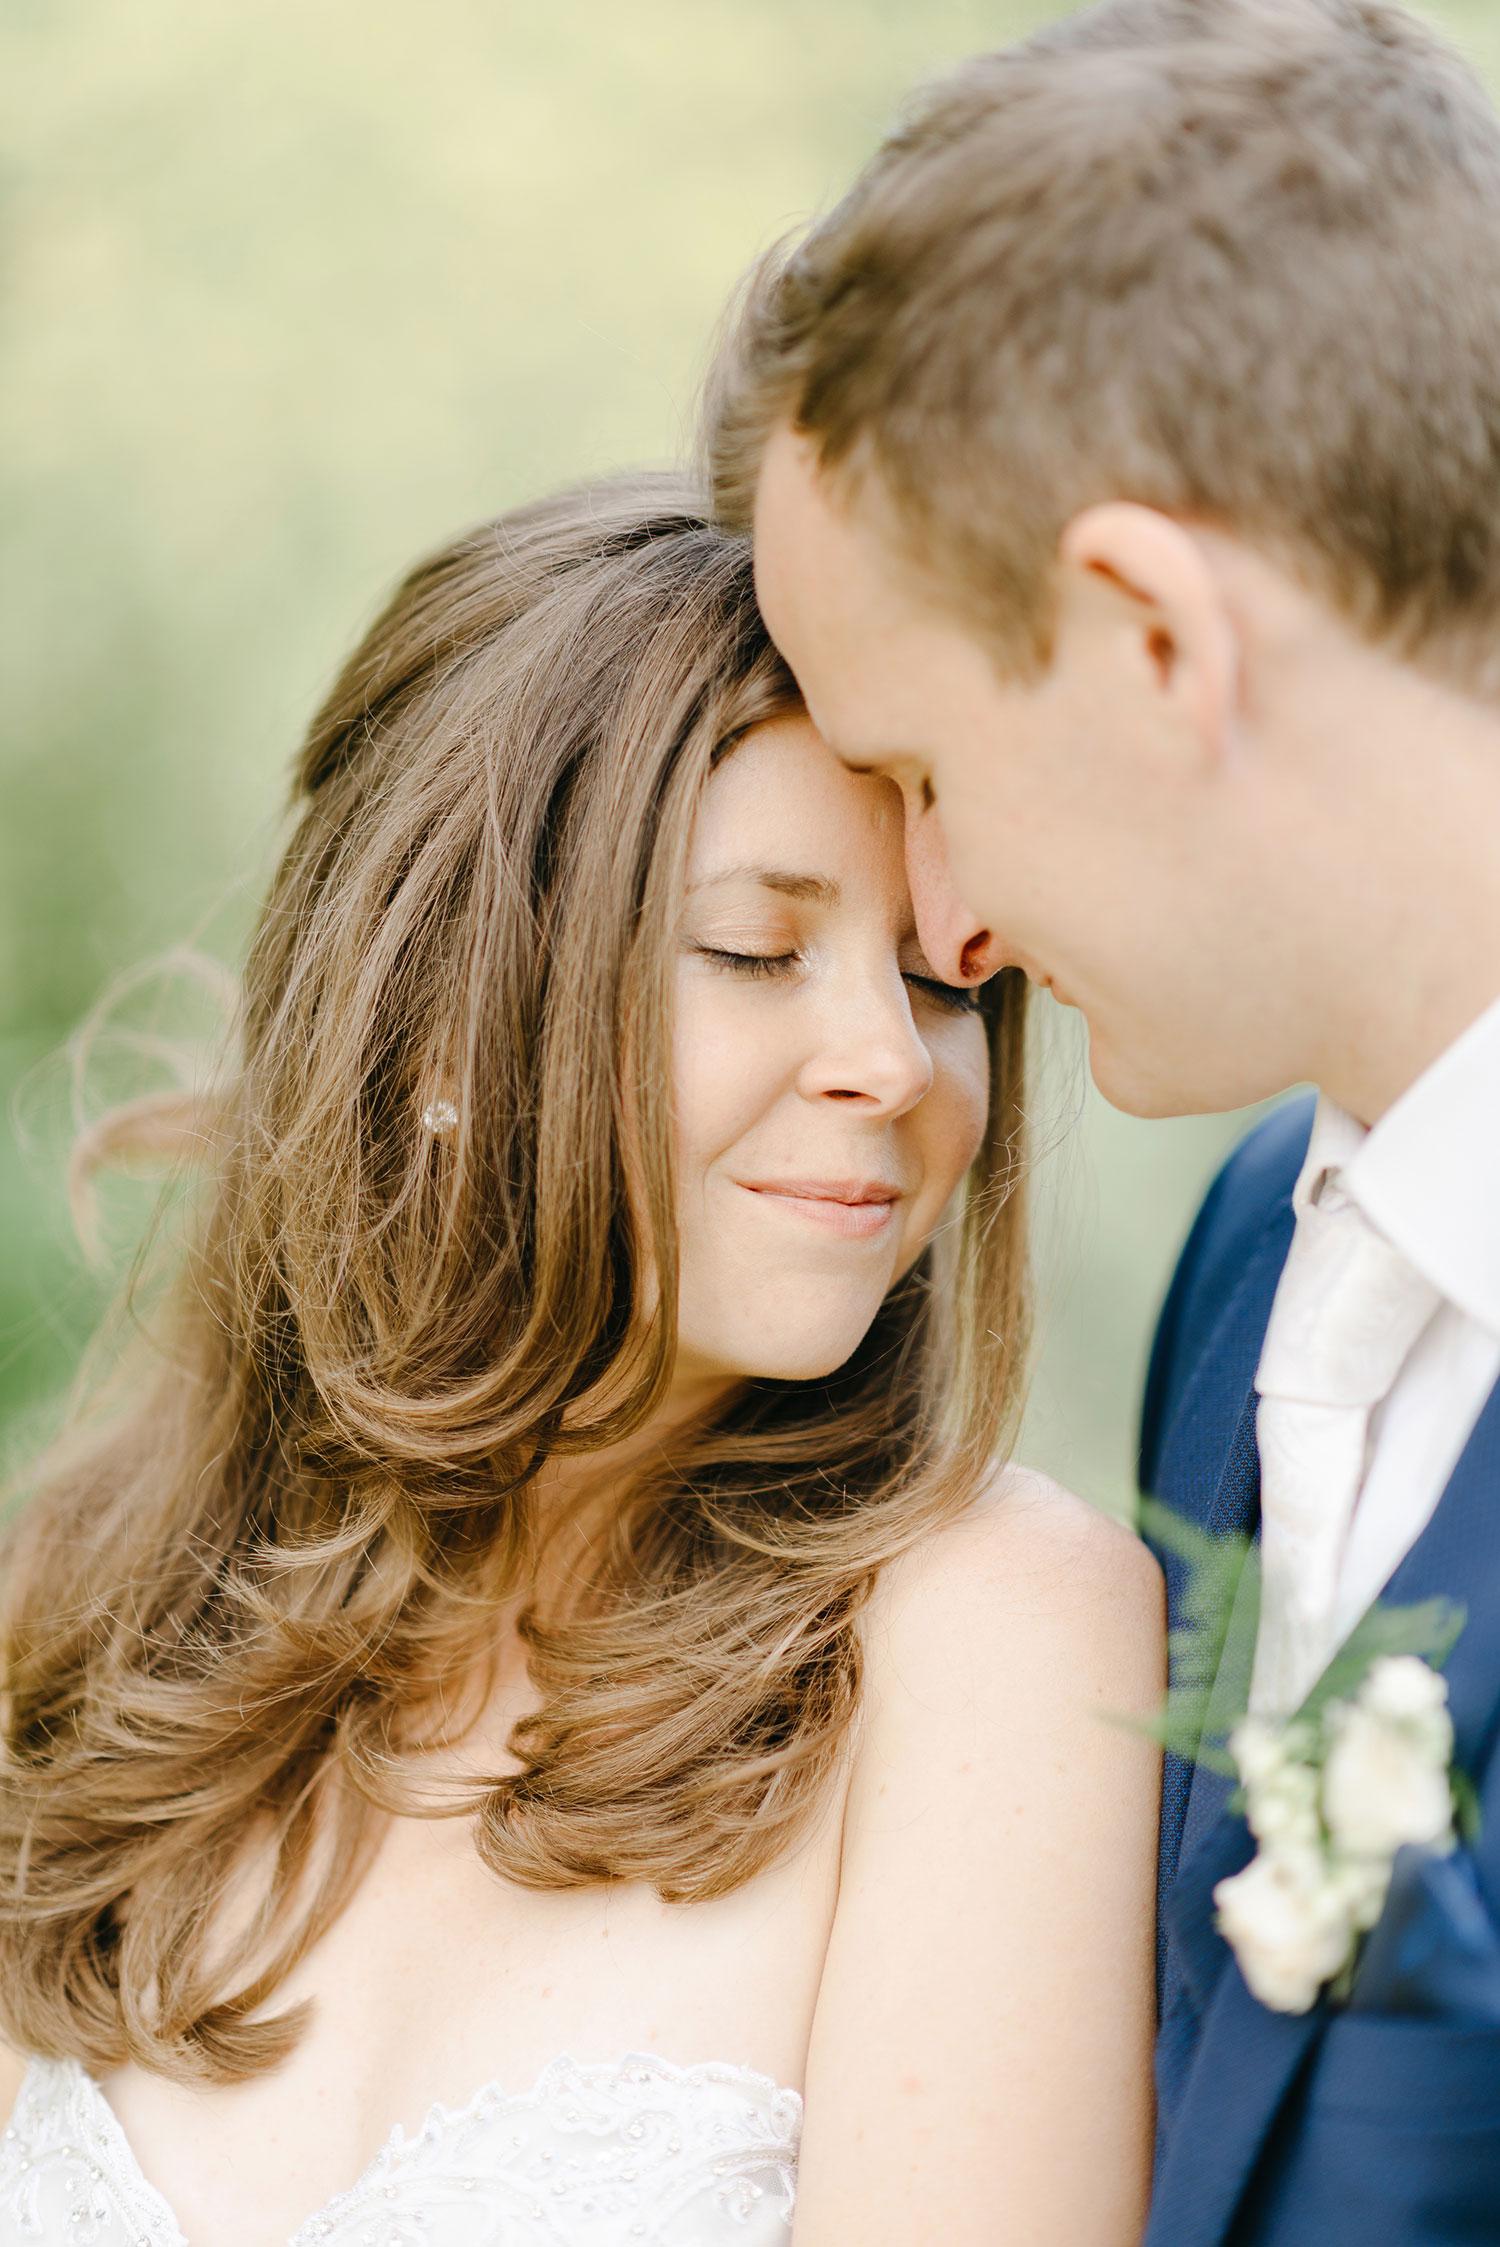 destination-wedding-photographer-ballinacurra-house-wedding-20180711_0051.jpg